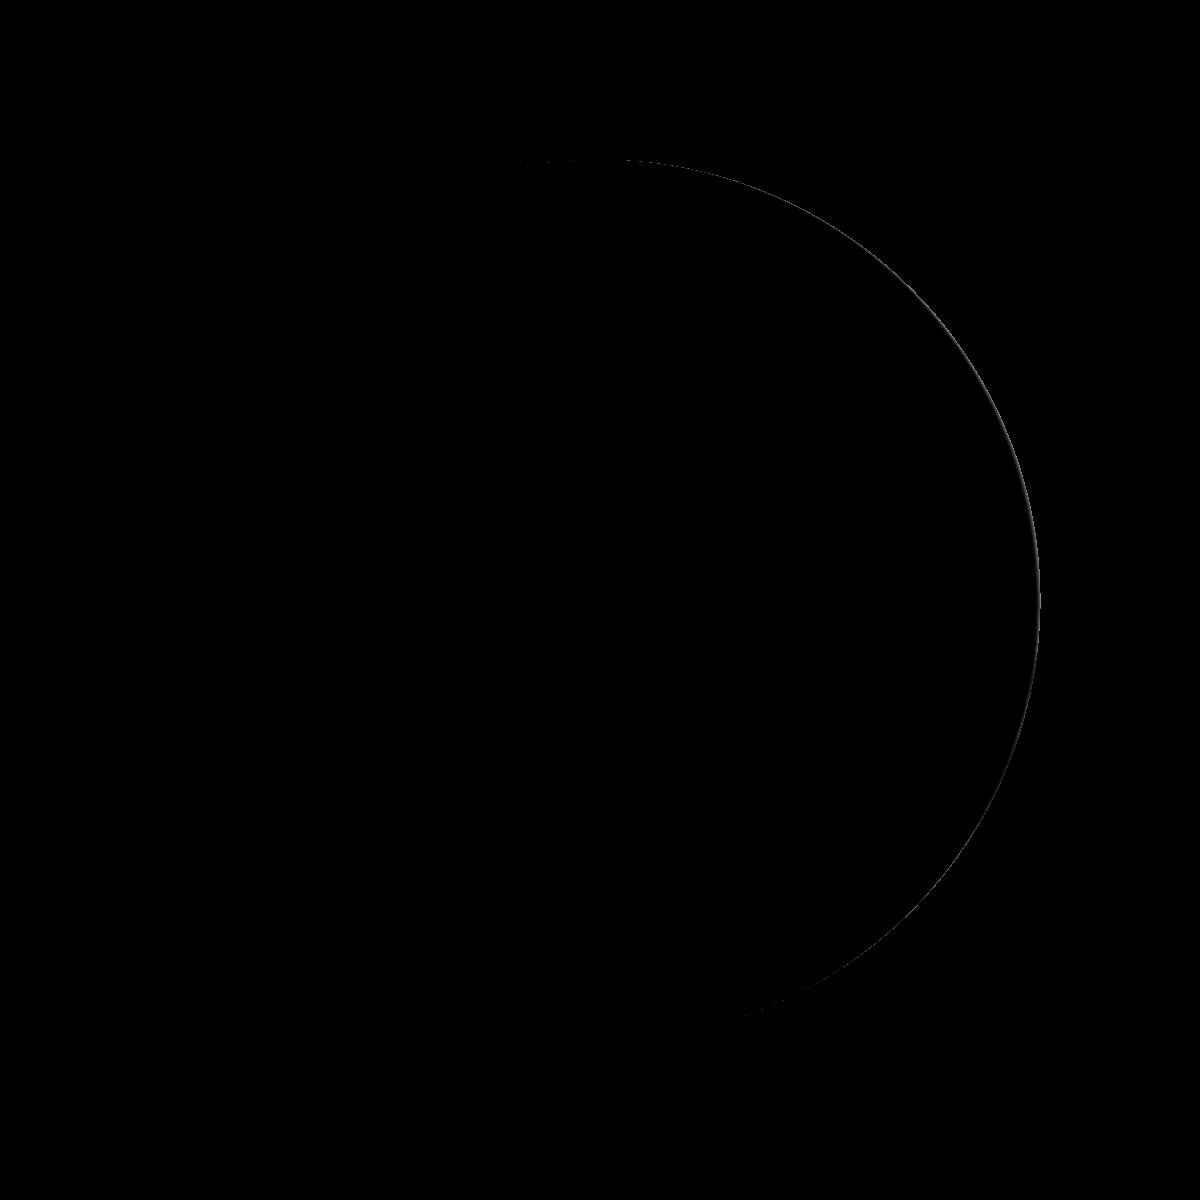 Lune du 25 mars 2020